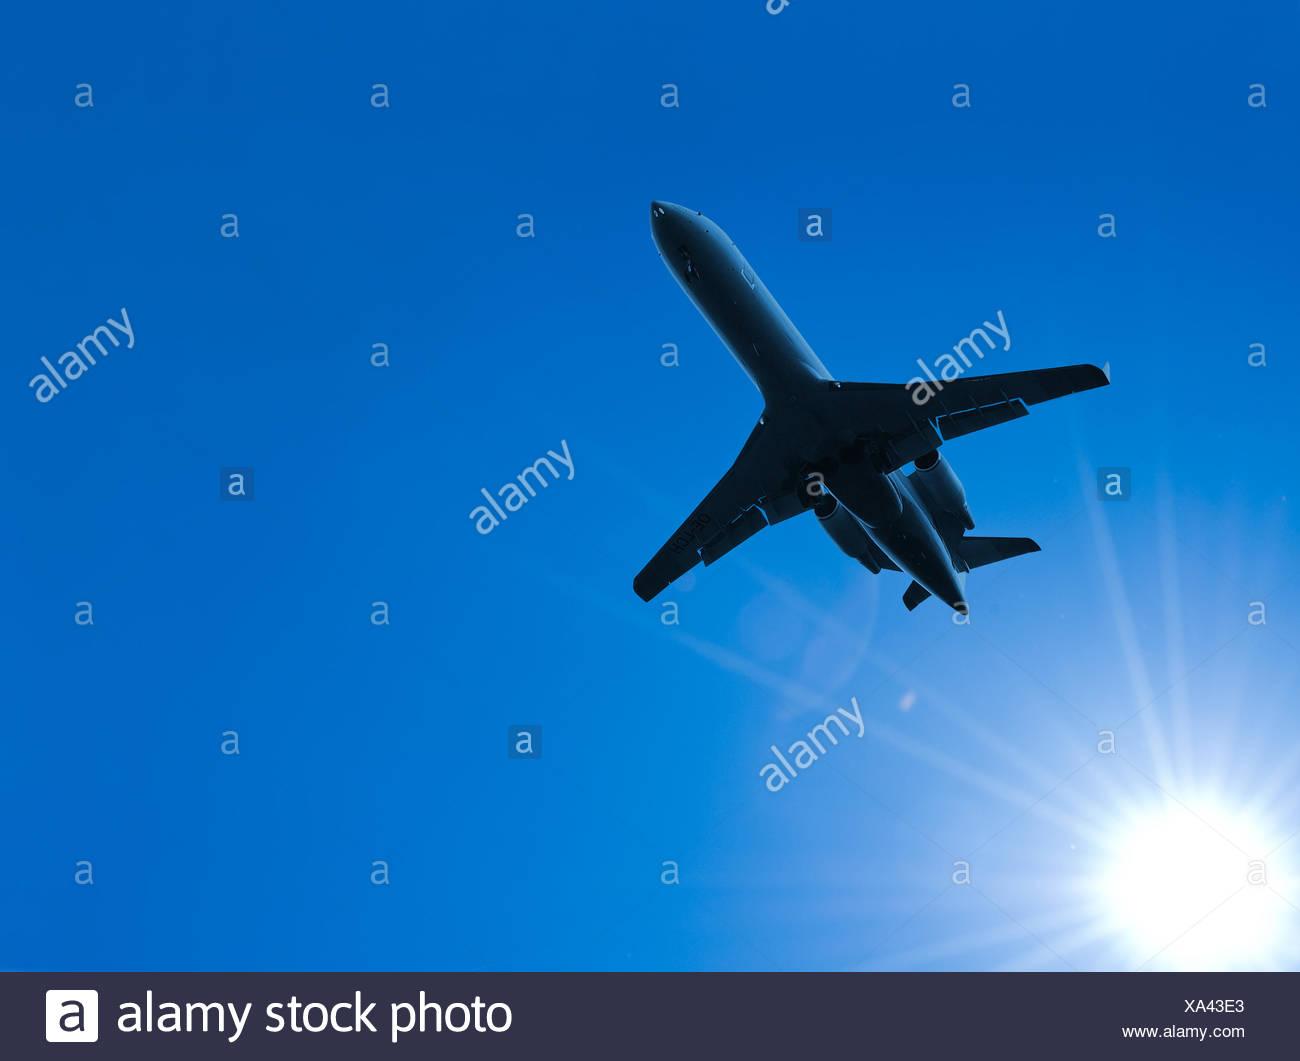 aeroplane - Stock Image